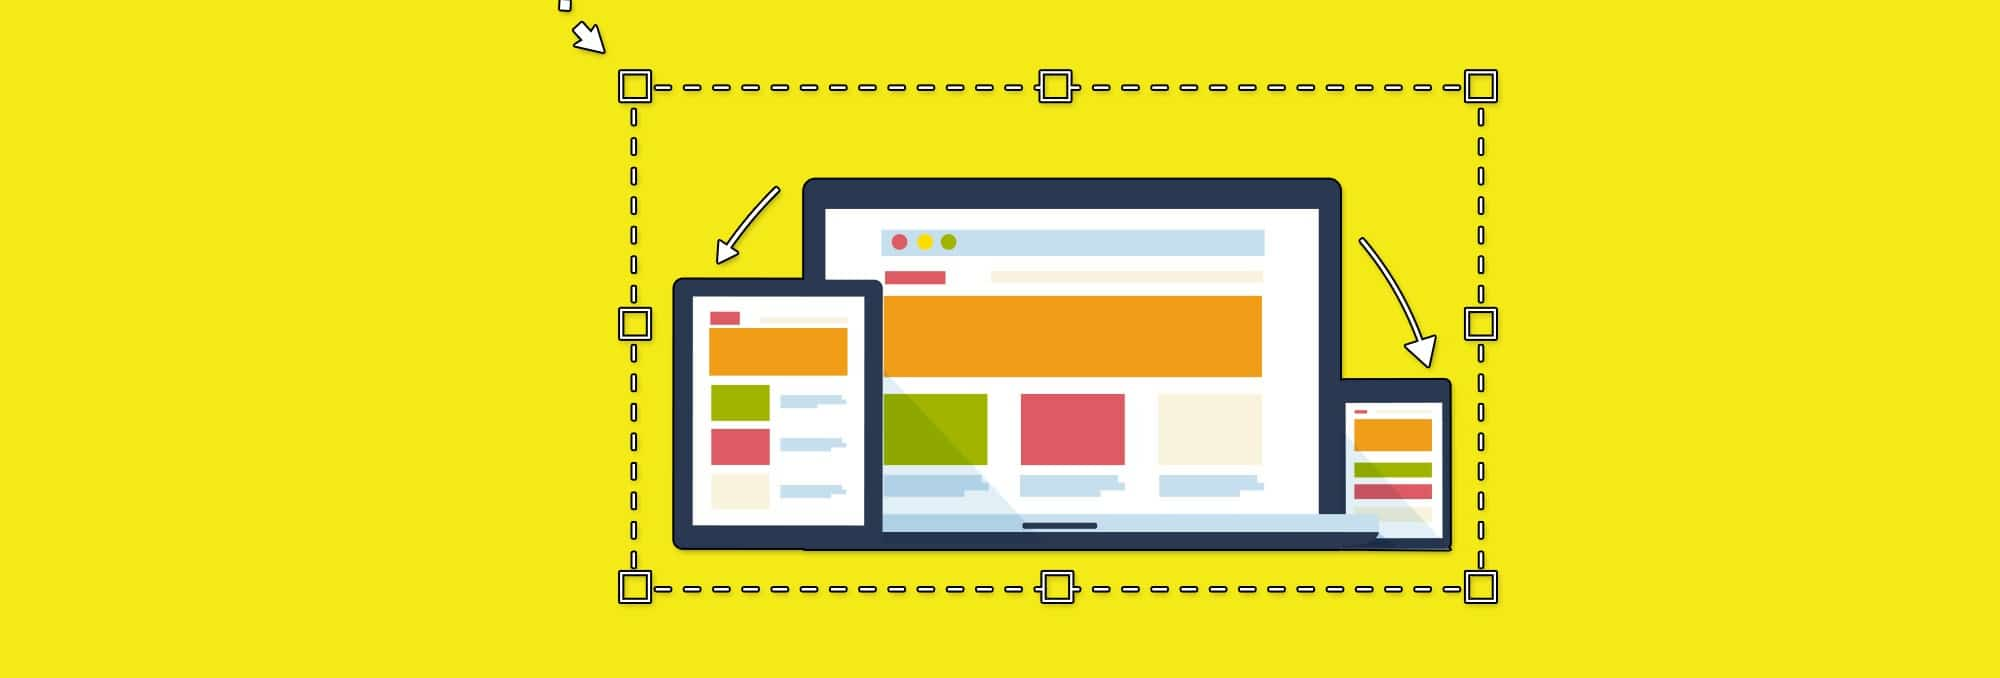 central alberta web development design mobile ready websites